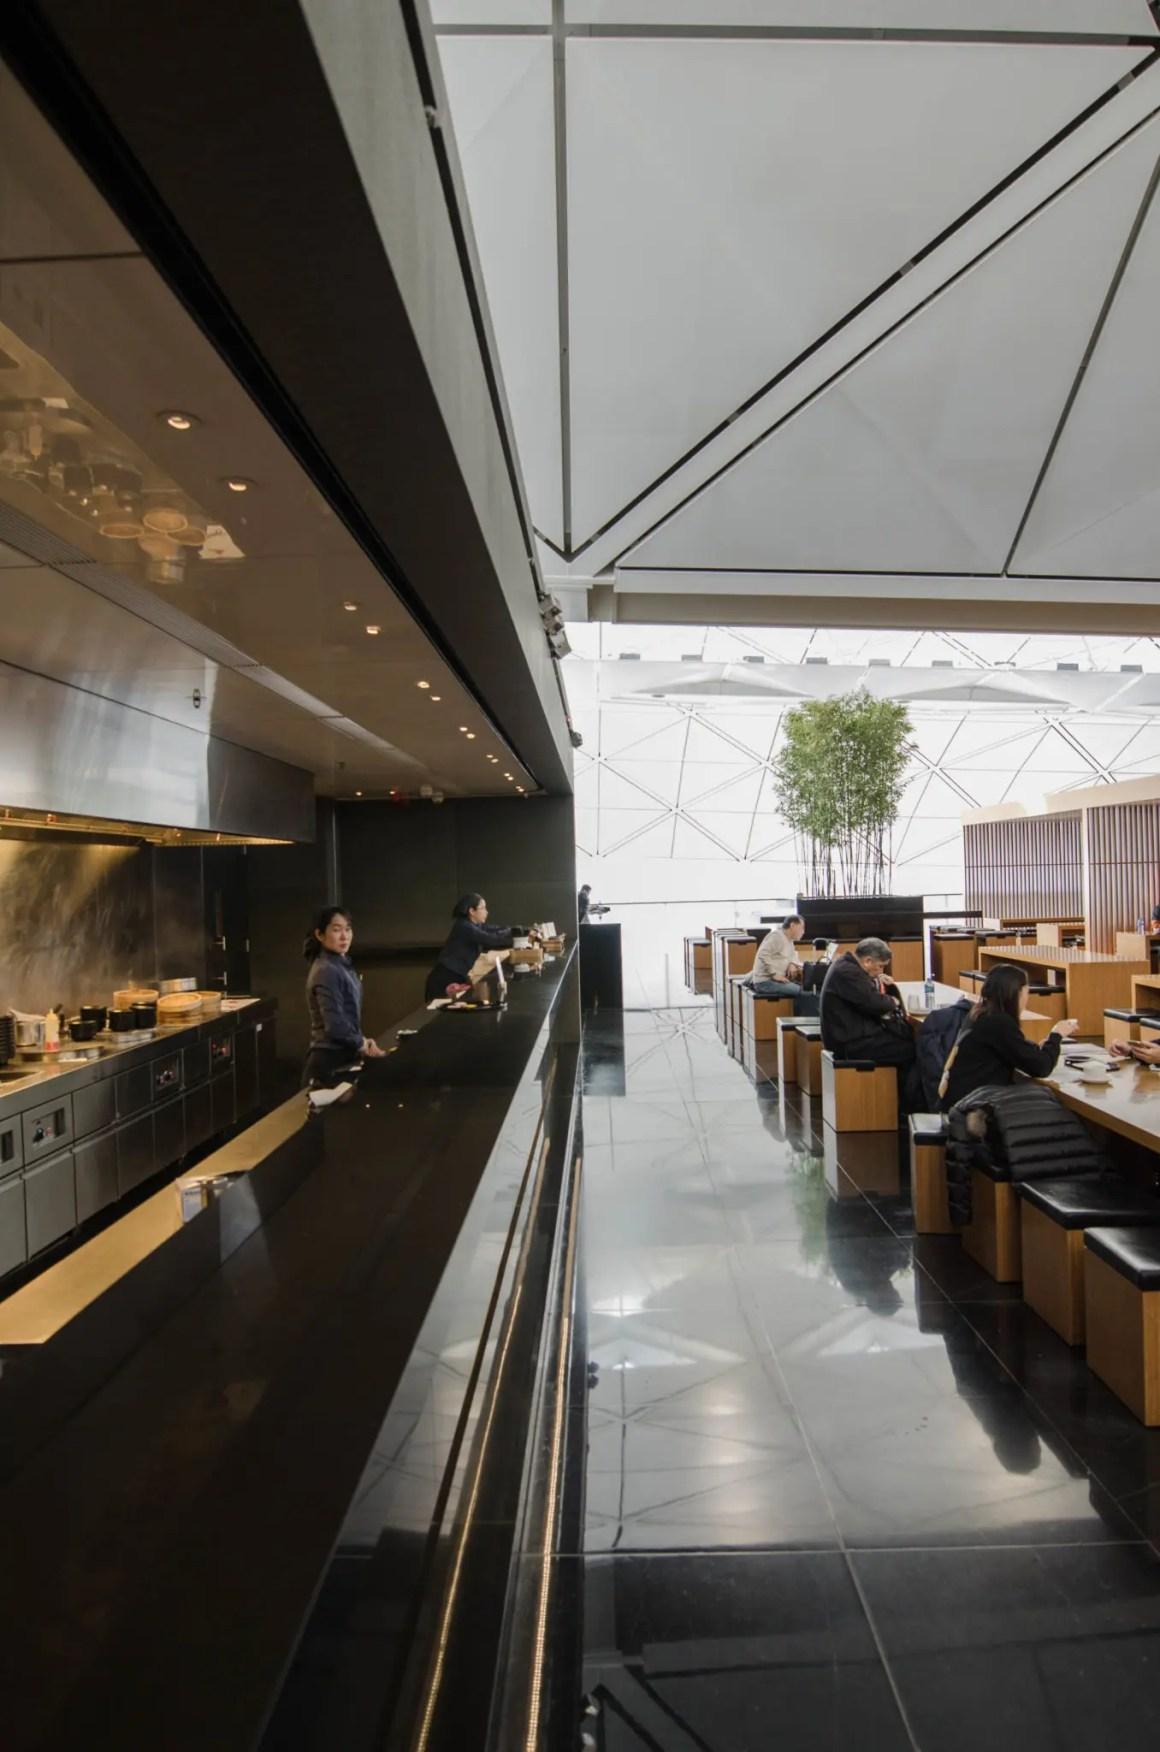 De Wing Business Class Lounge van Cathay Pacific is de beste start in de Cathay Pacific Business Class.